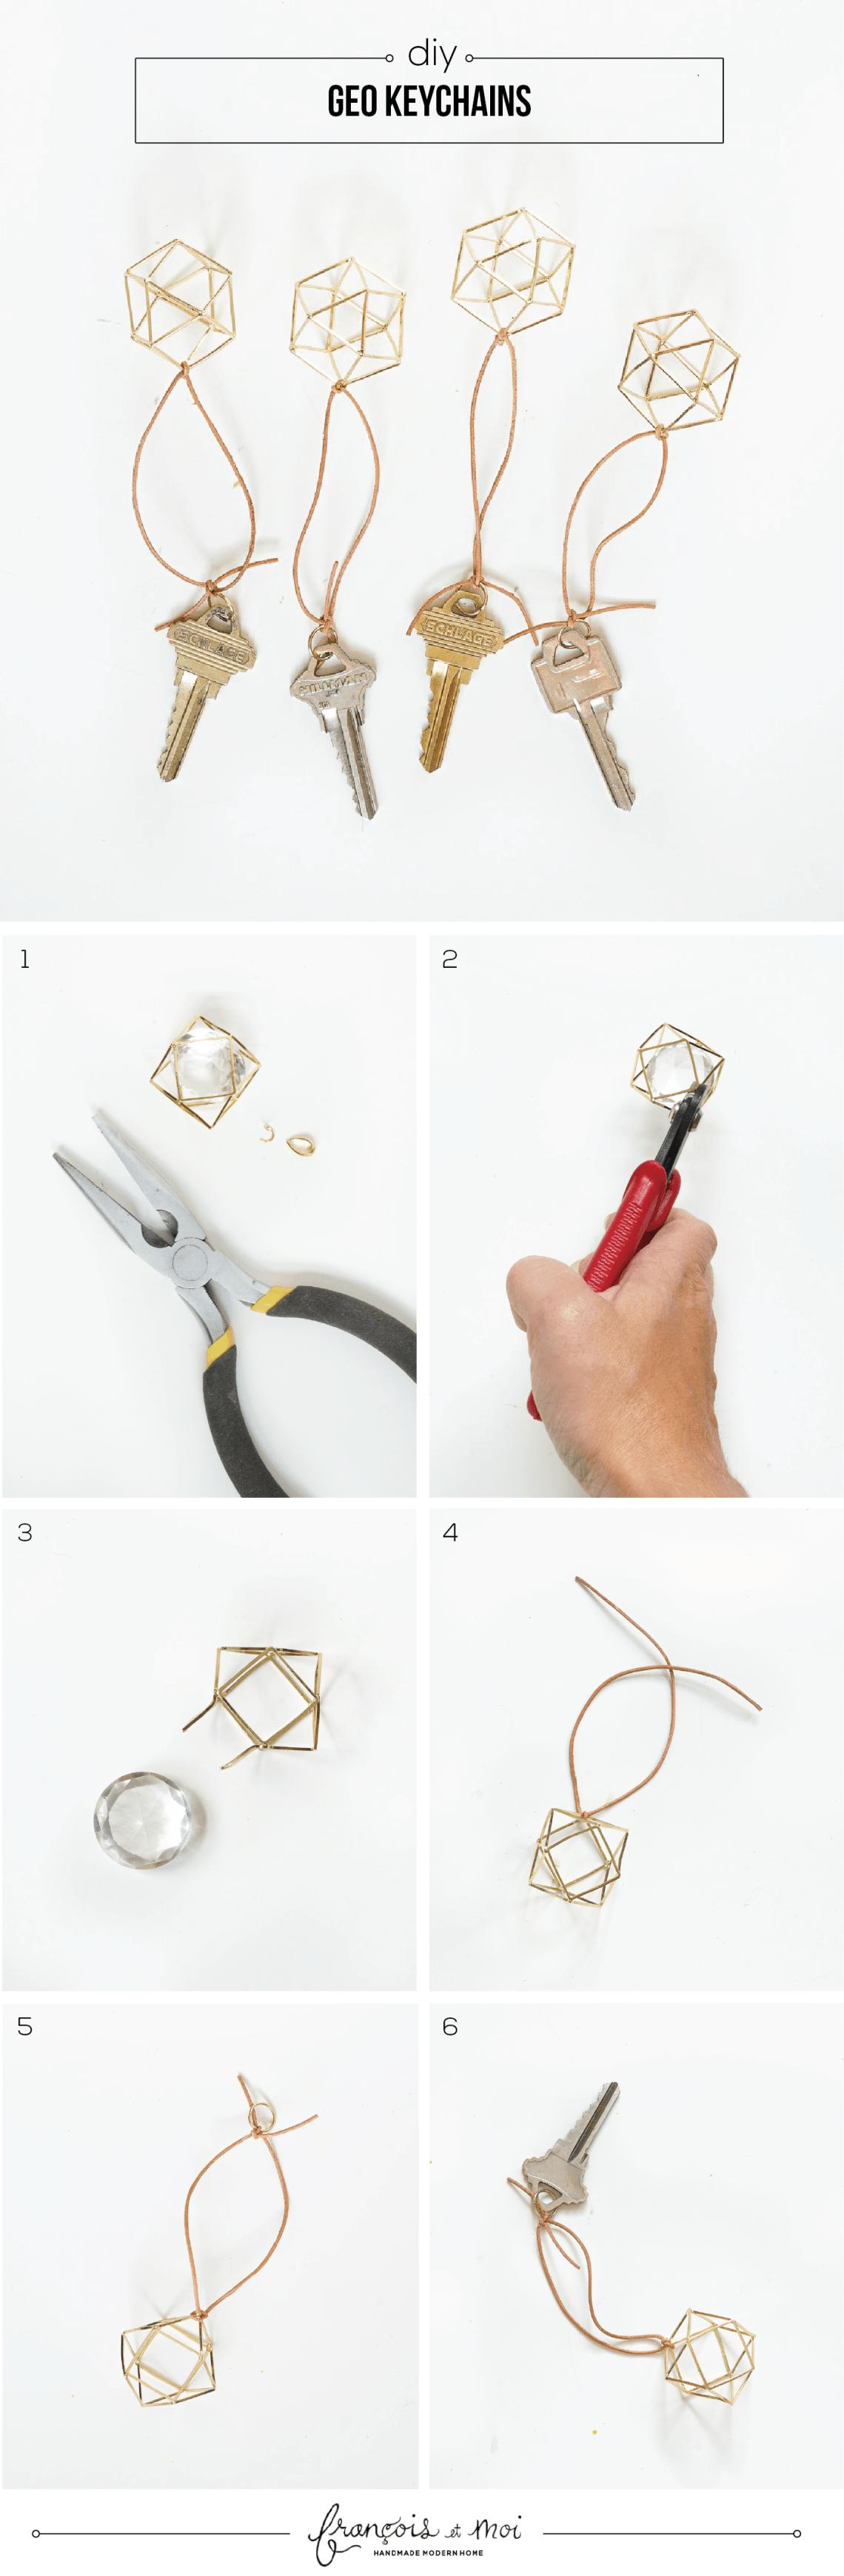 DIY Geometric Keychain Tutorial